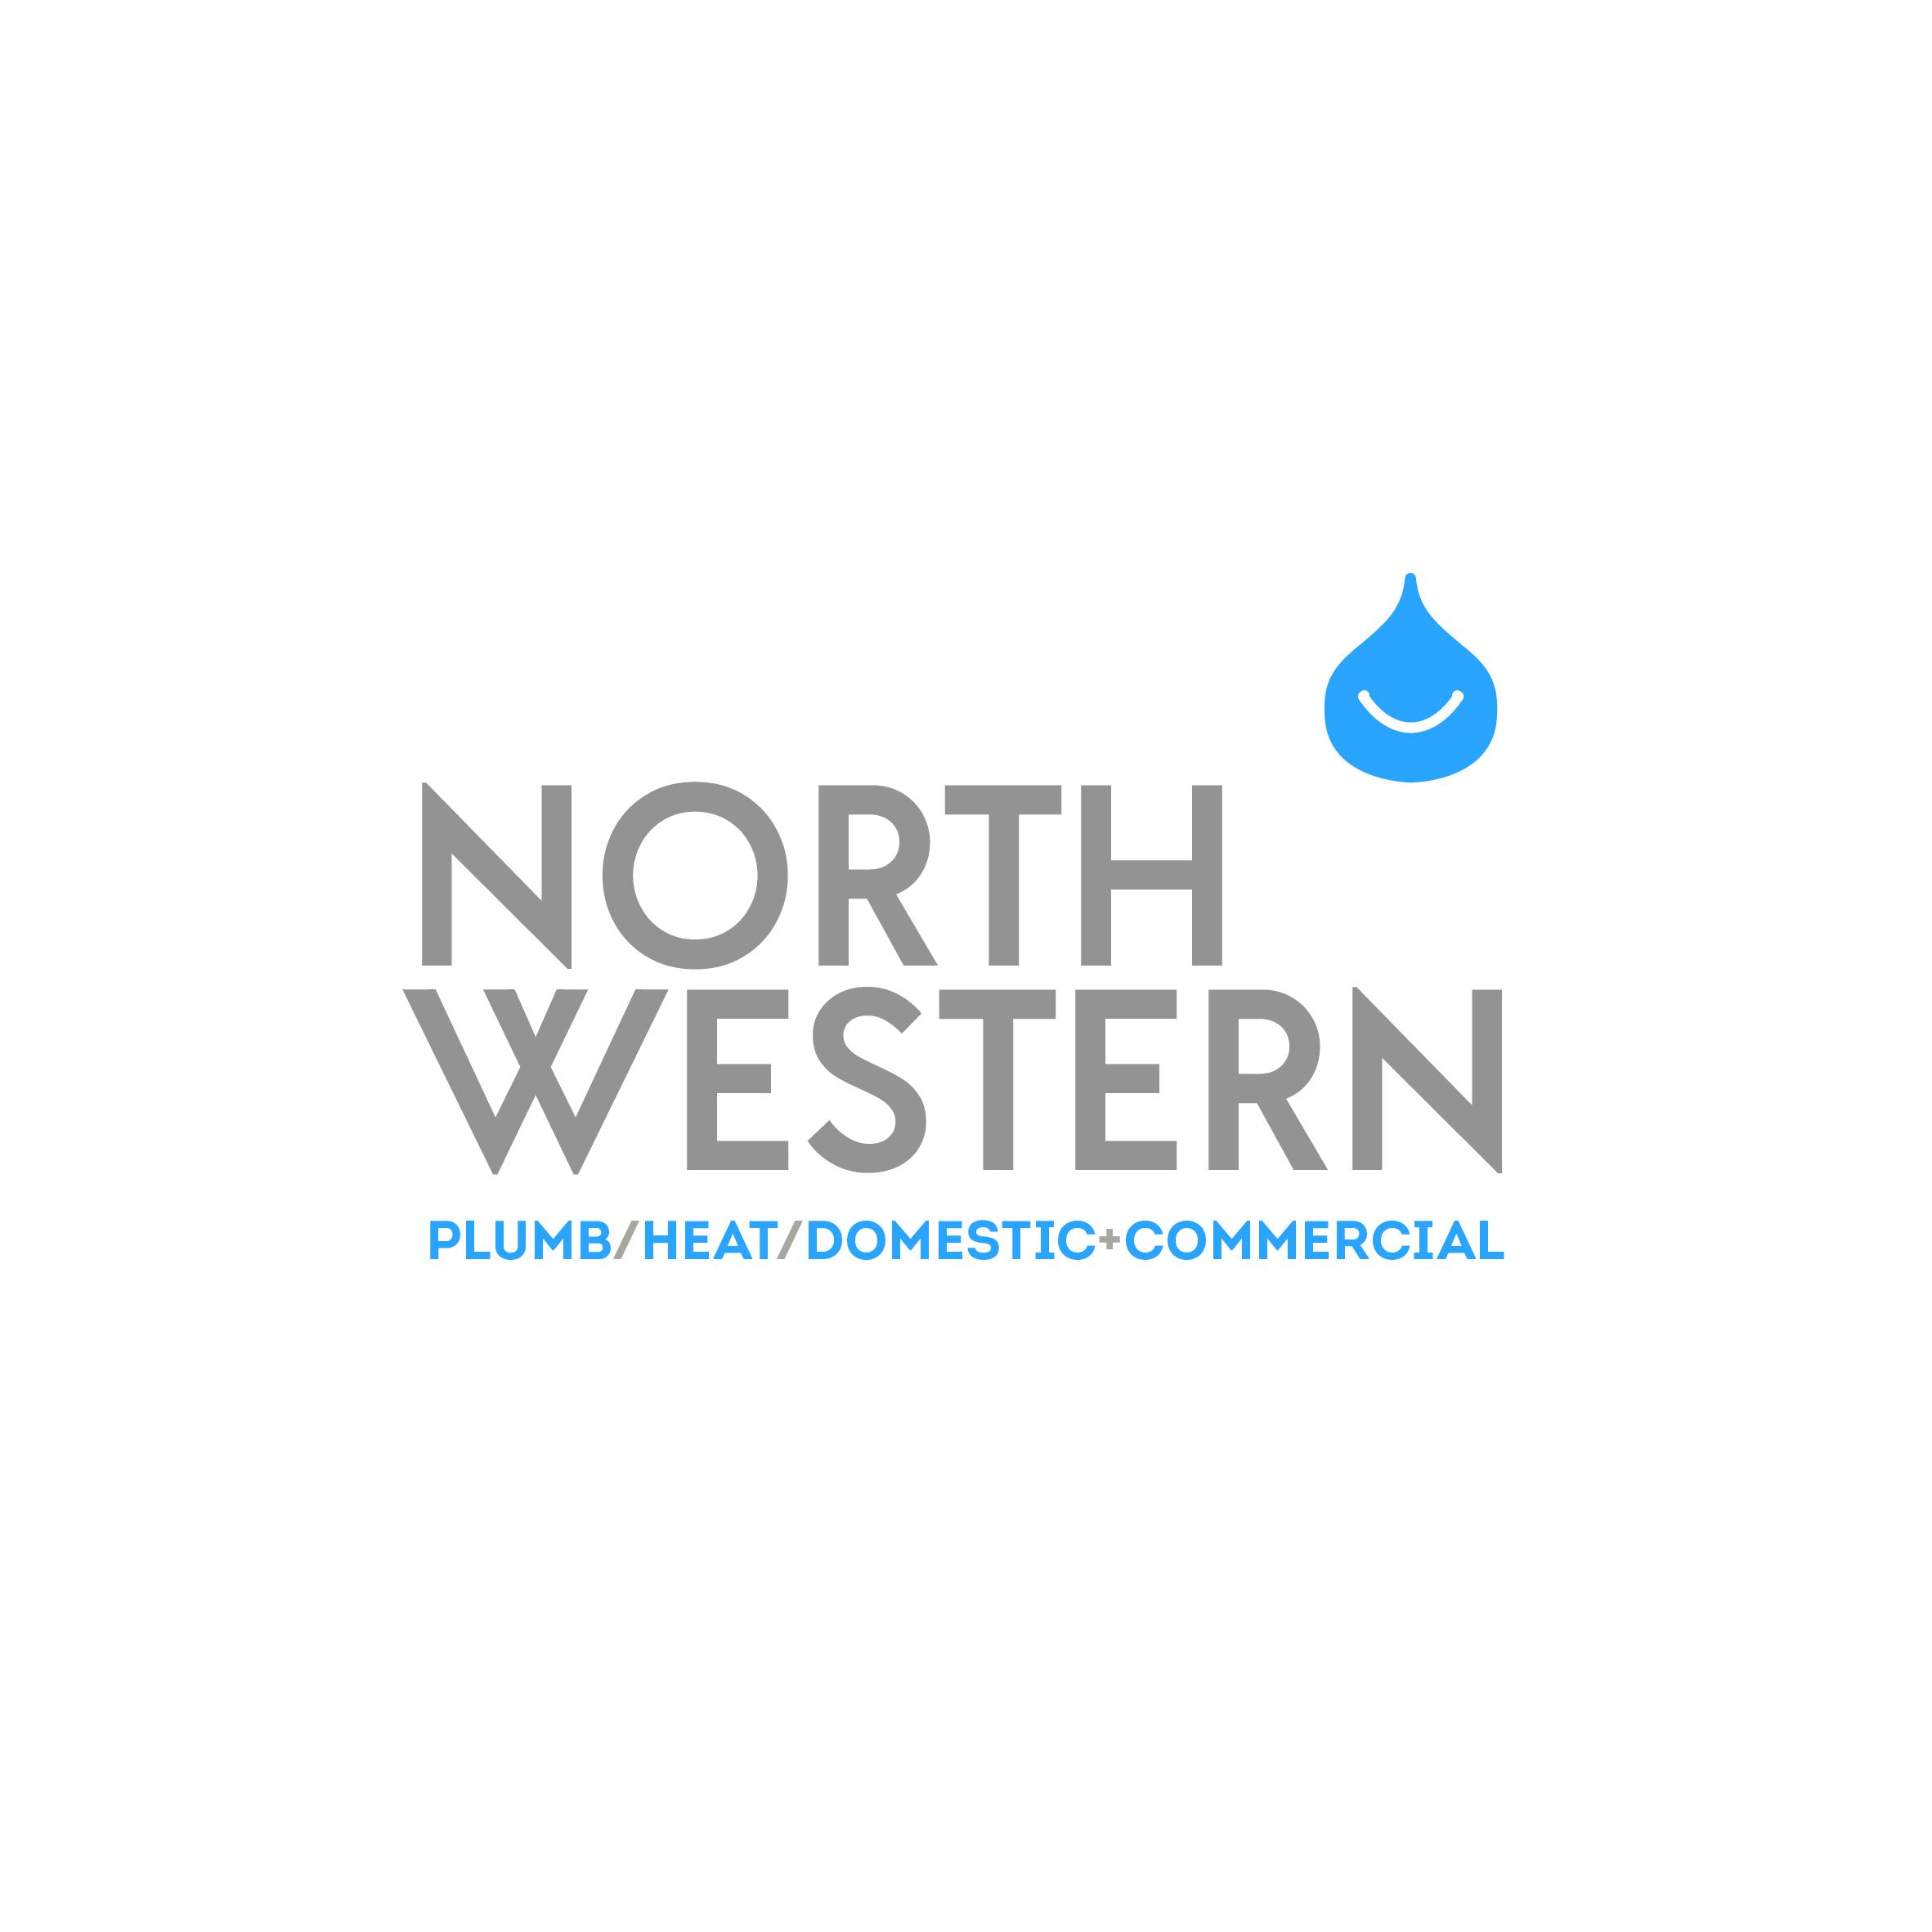 north western-01